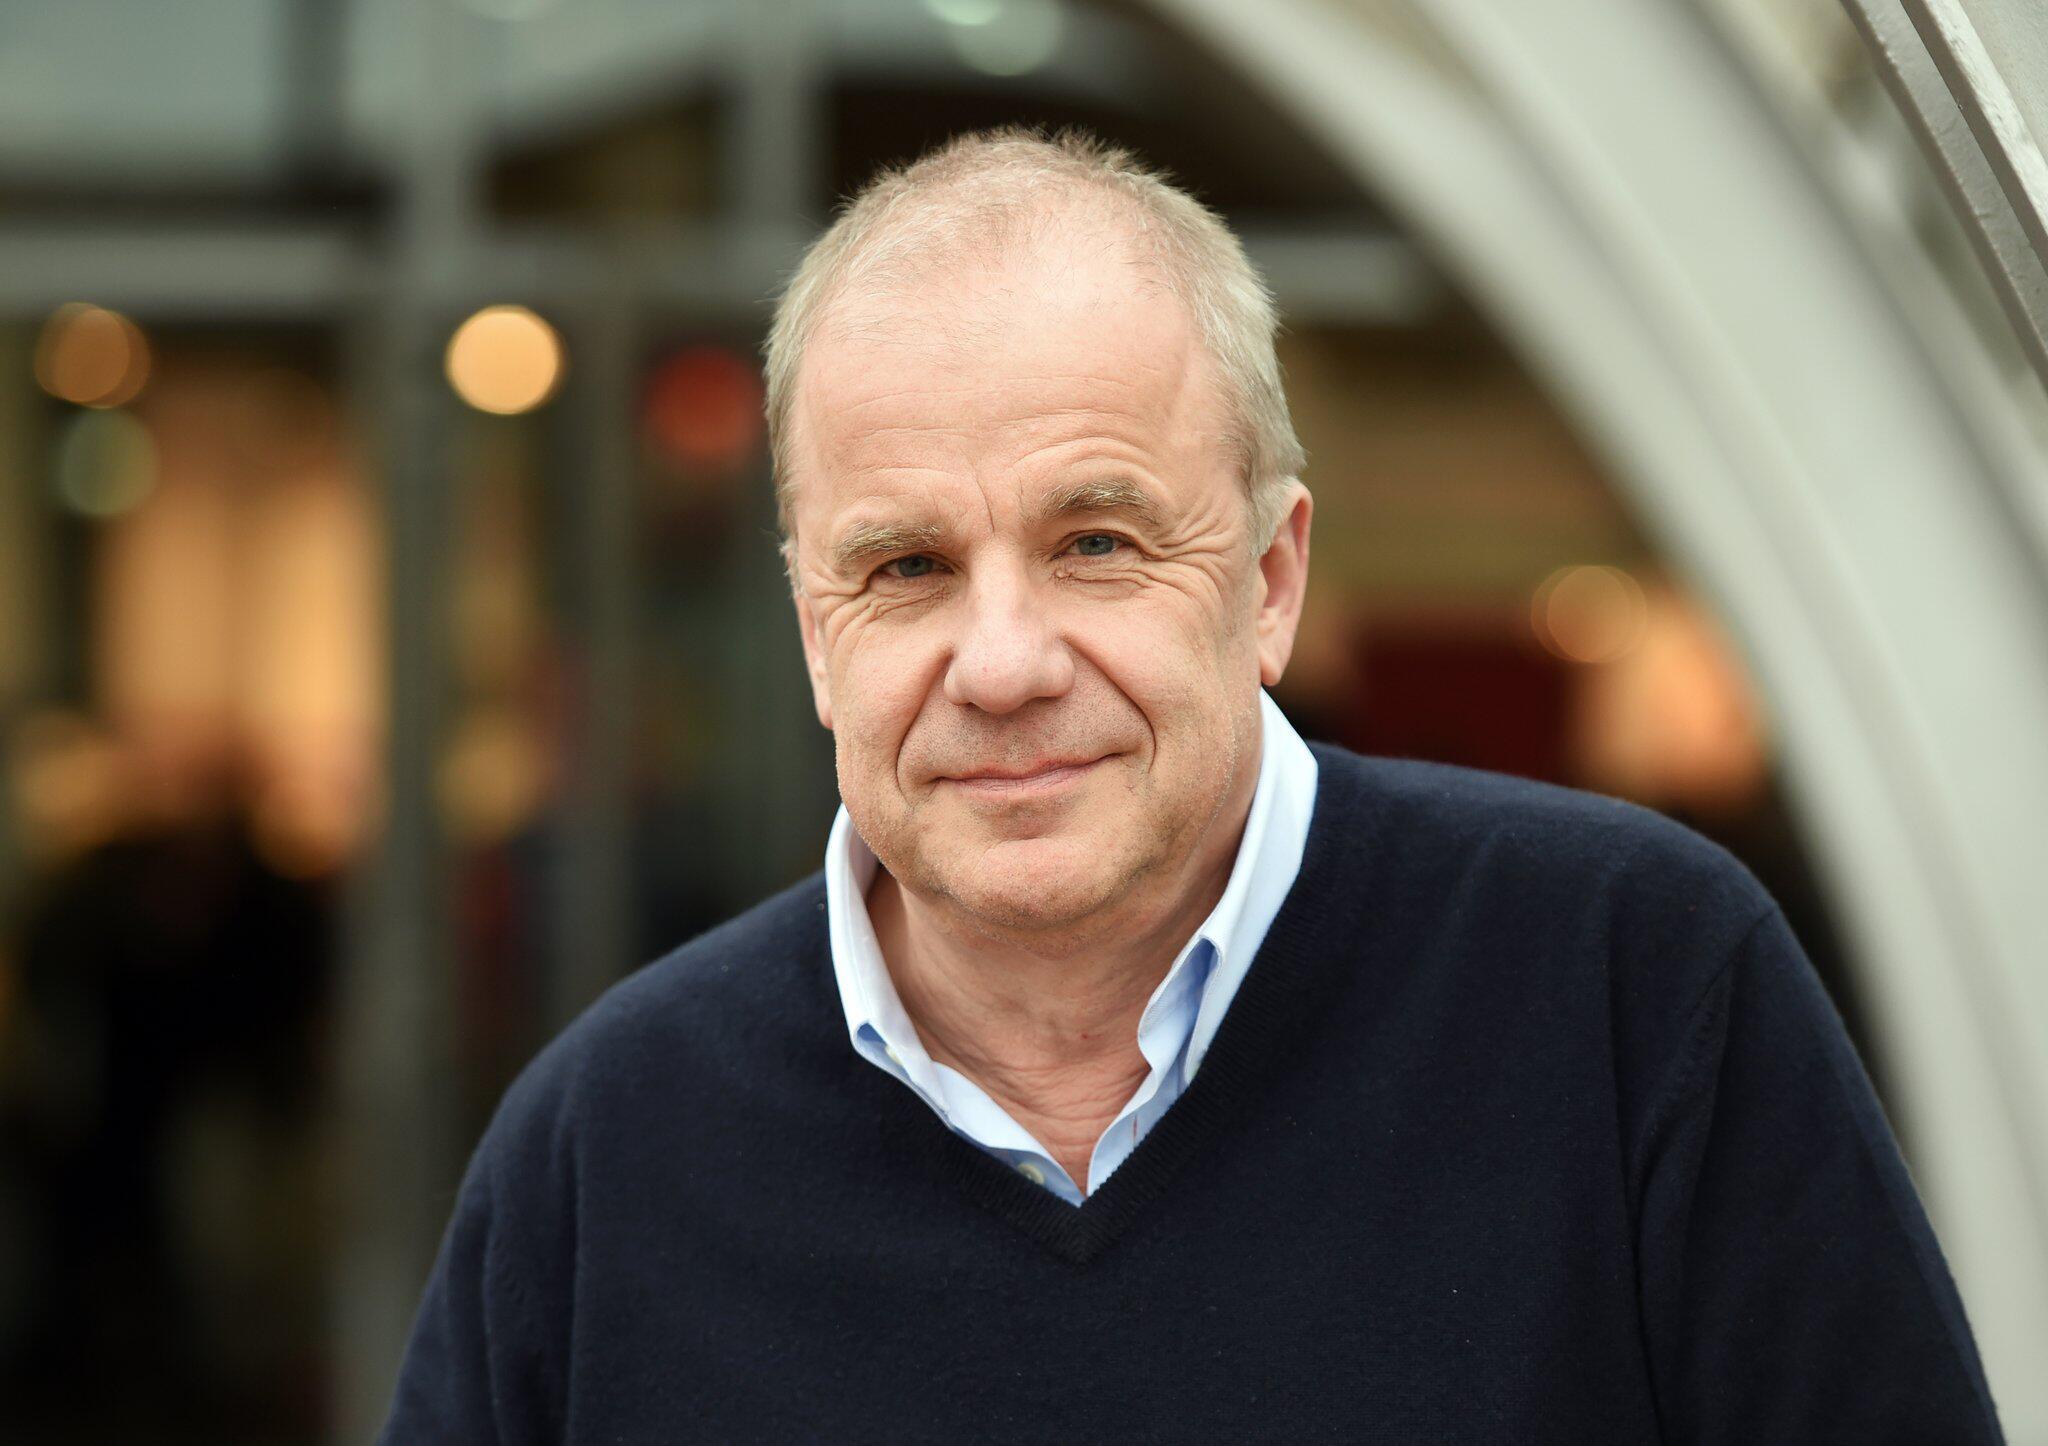 Bild zu NDR-Moderator Hubertus Meyer-Burckhardt hat Krebs